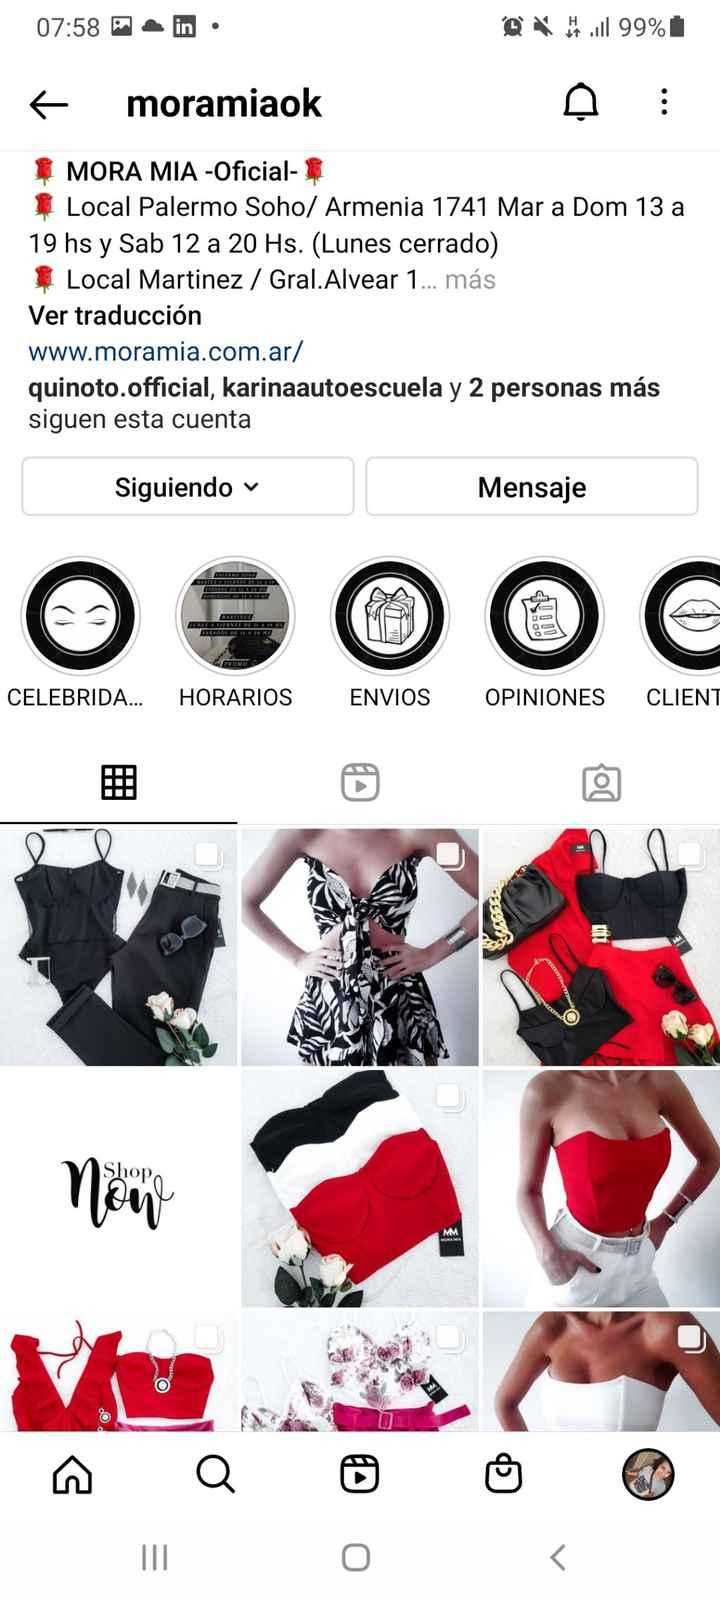 S.o.s - consulta sobre corsets - 1